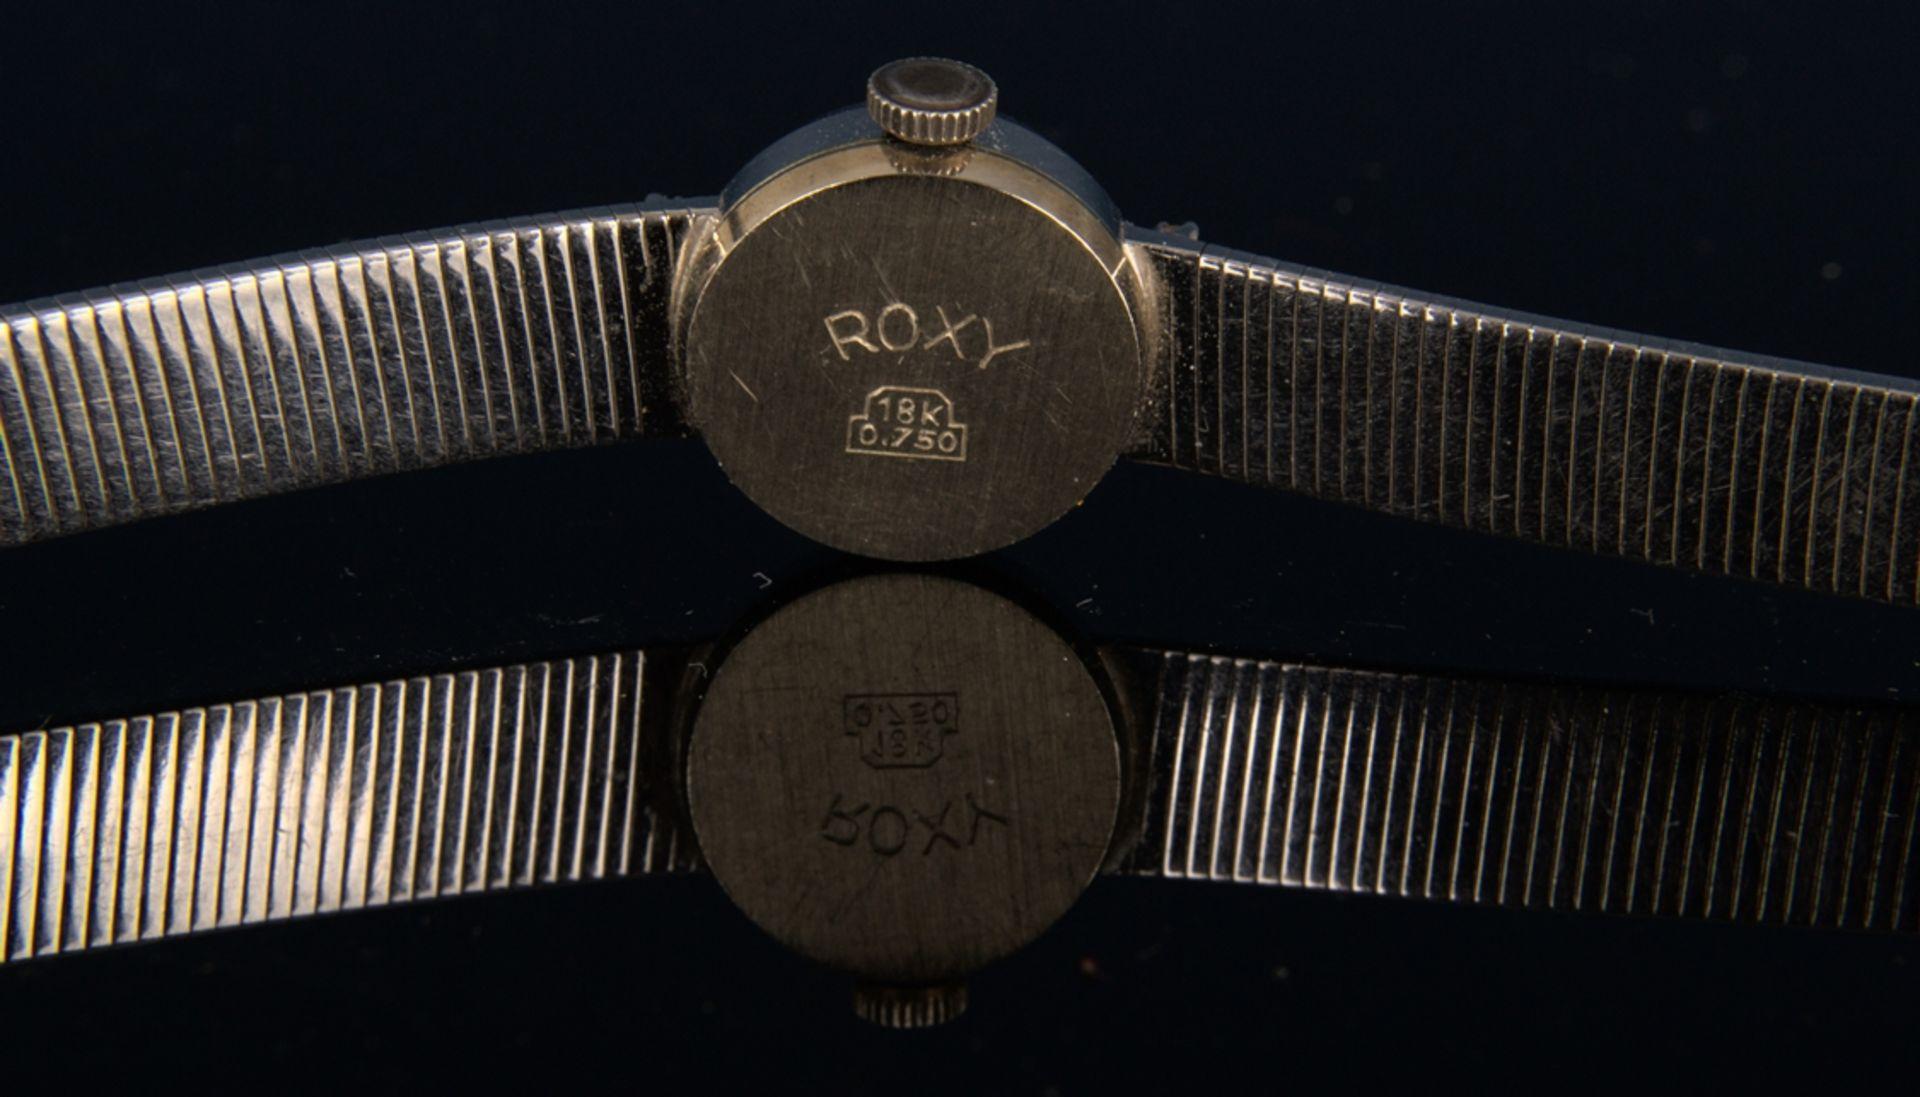 "Elegante COCKTAIL - Damenarmbanduhr der Marke ""ANKER - ROXY"" - 17 Rubis - Incabloc. Handaufzug, - Bild 7 aus 11"